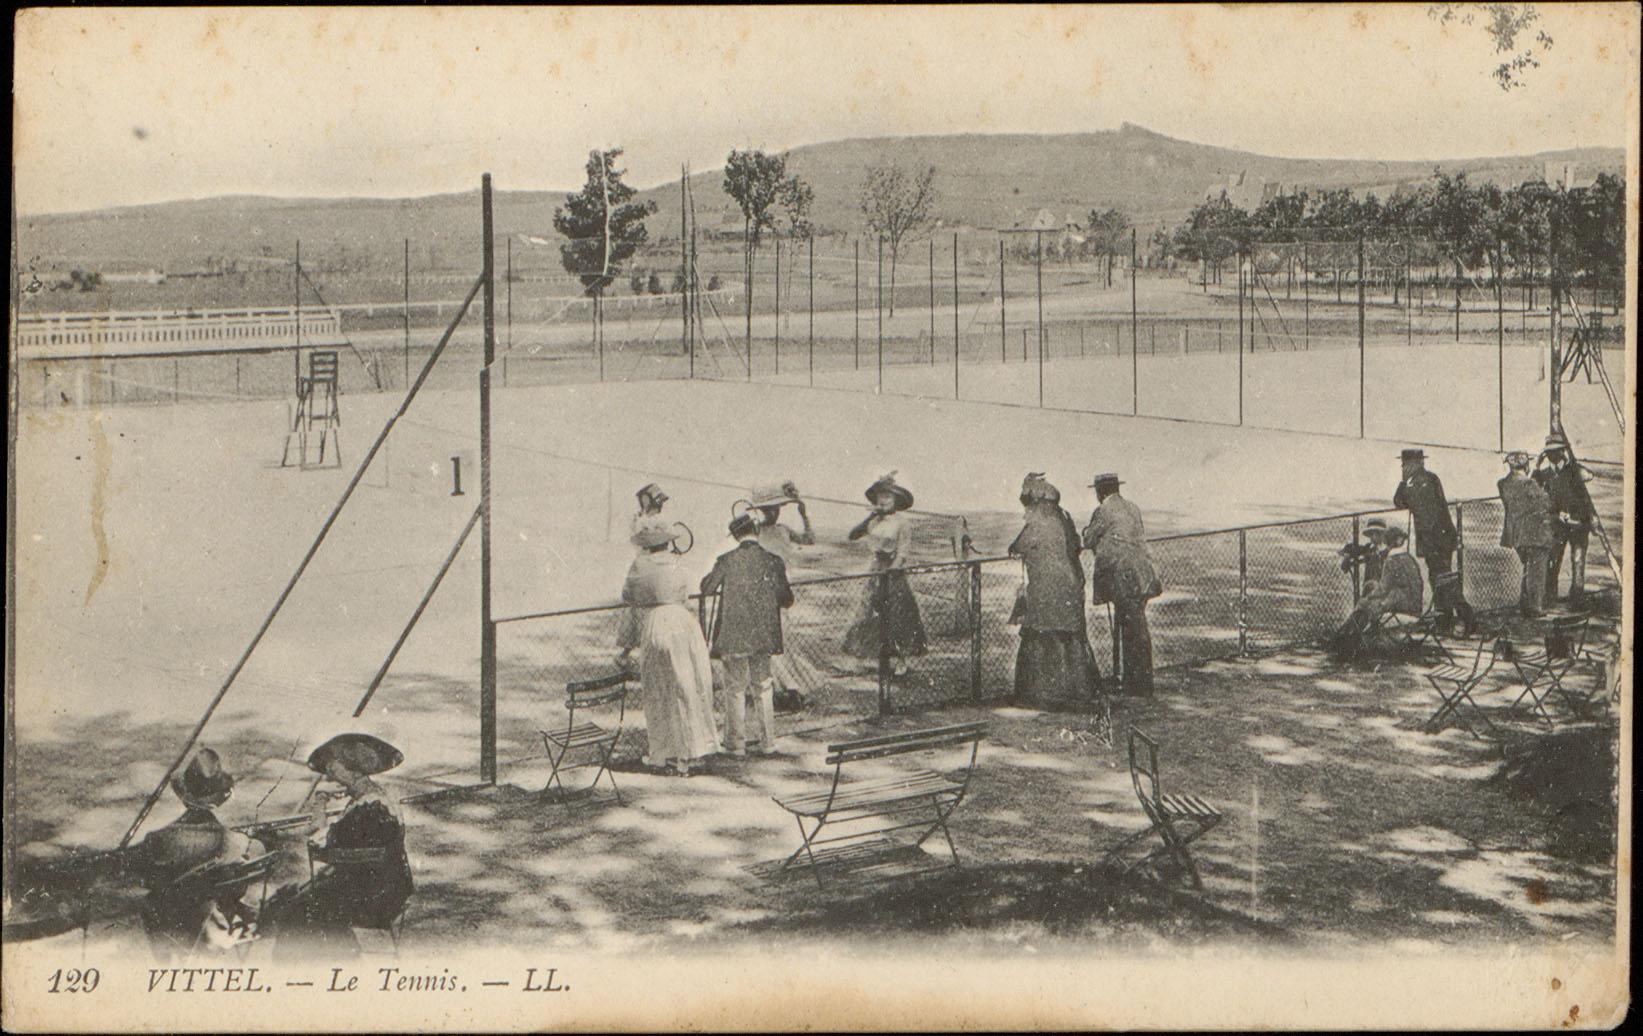 Contenu du Vittel, Le Tennis